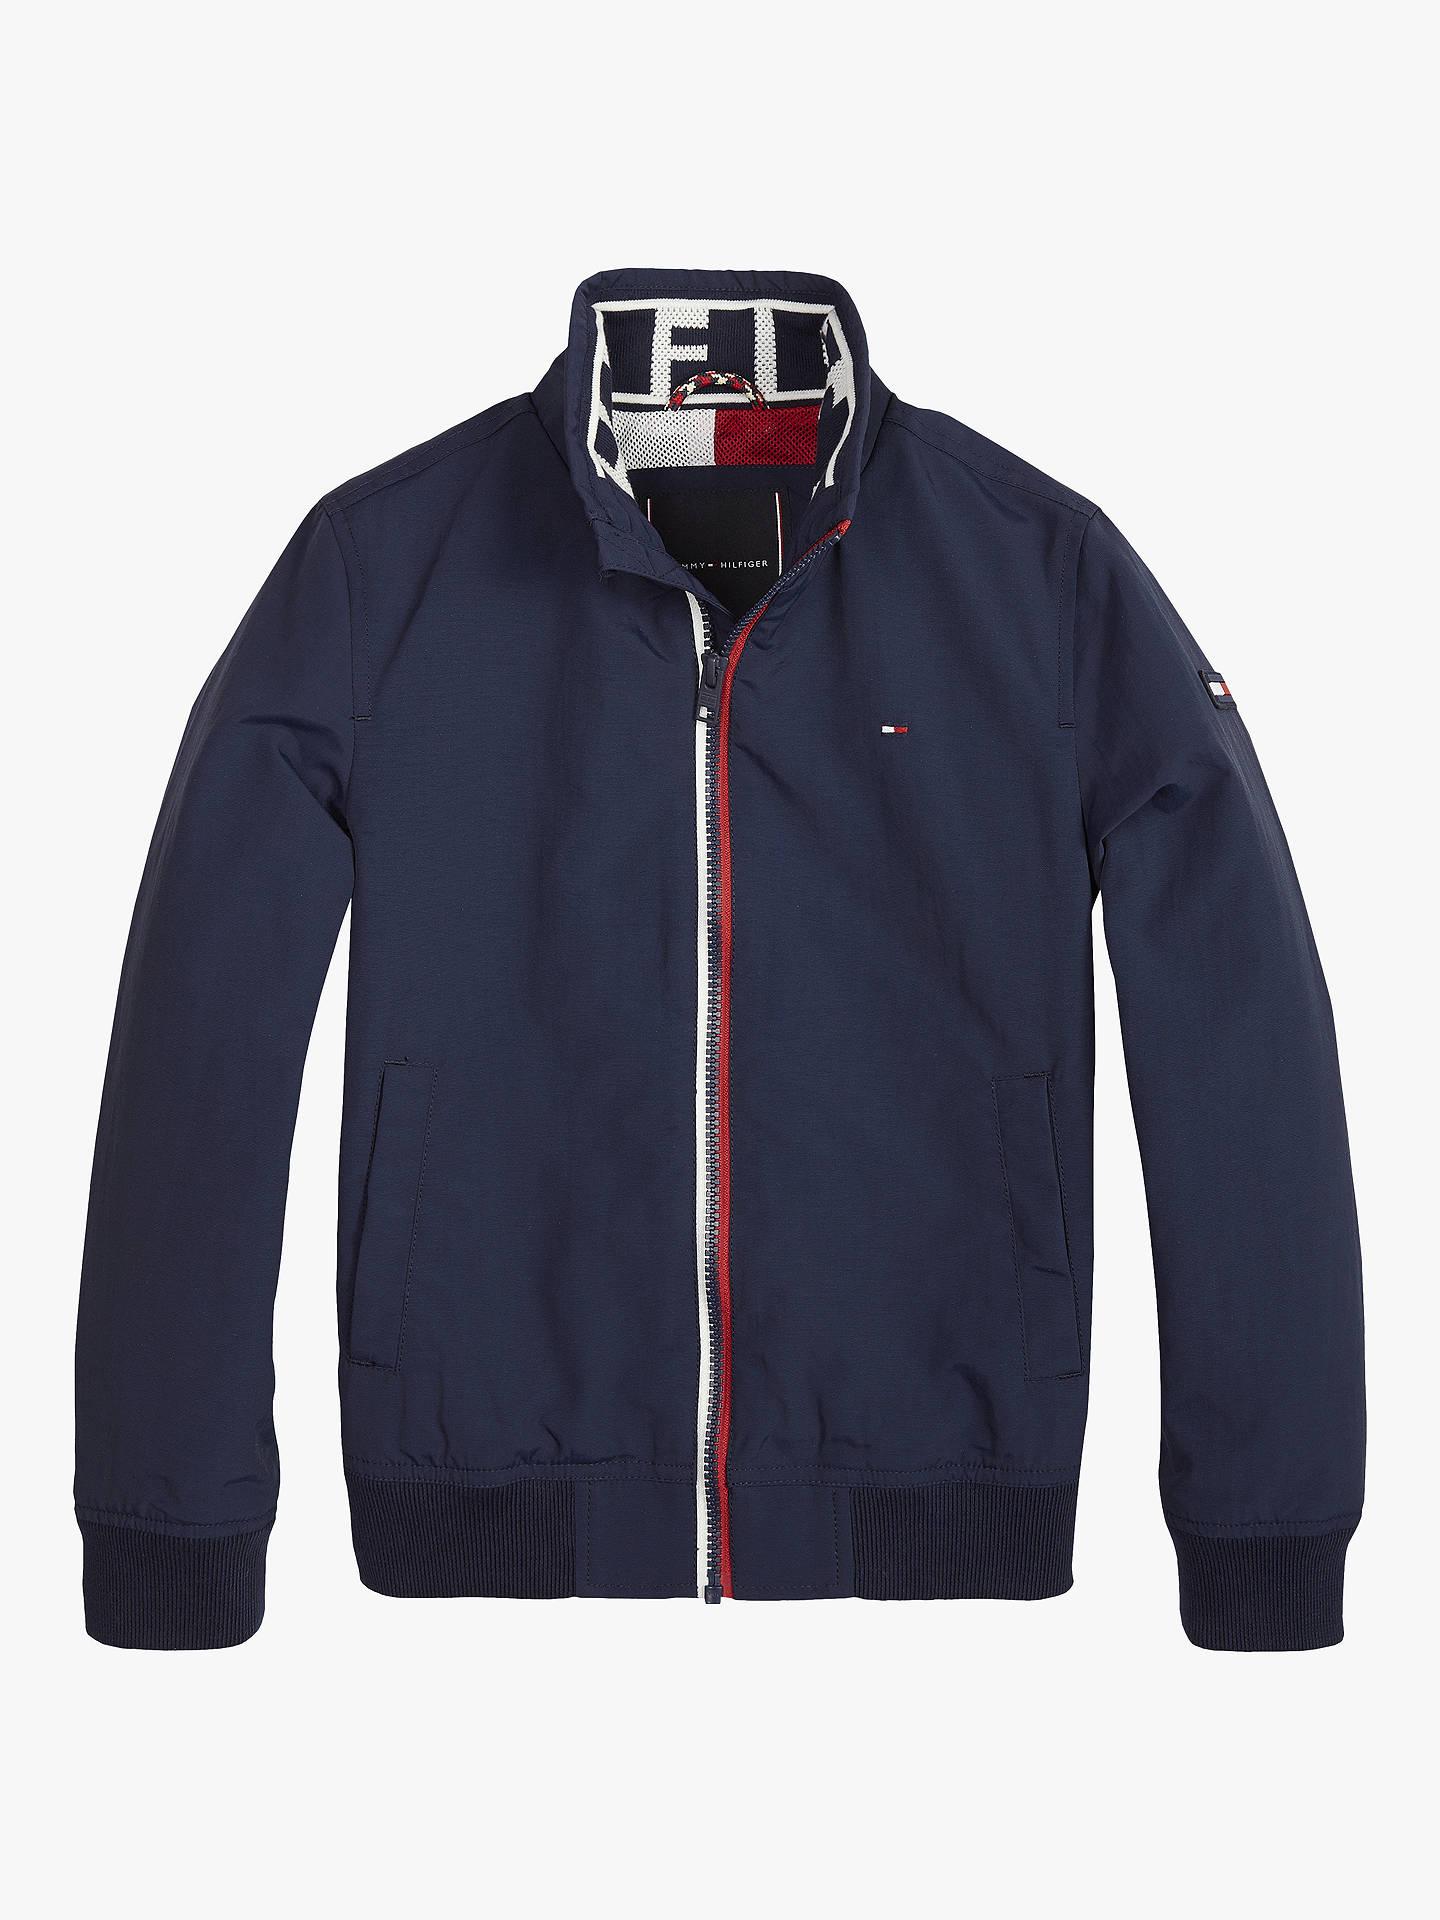 0baac40c5 Buy Tommy Hilfiger Boys' Essential Jacket, Navy, 16 years Online at  johnlewis.